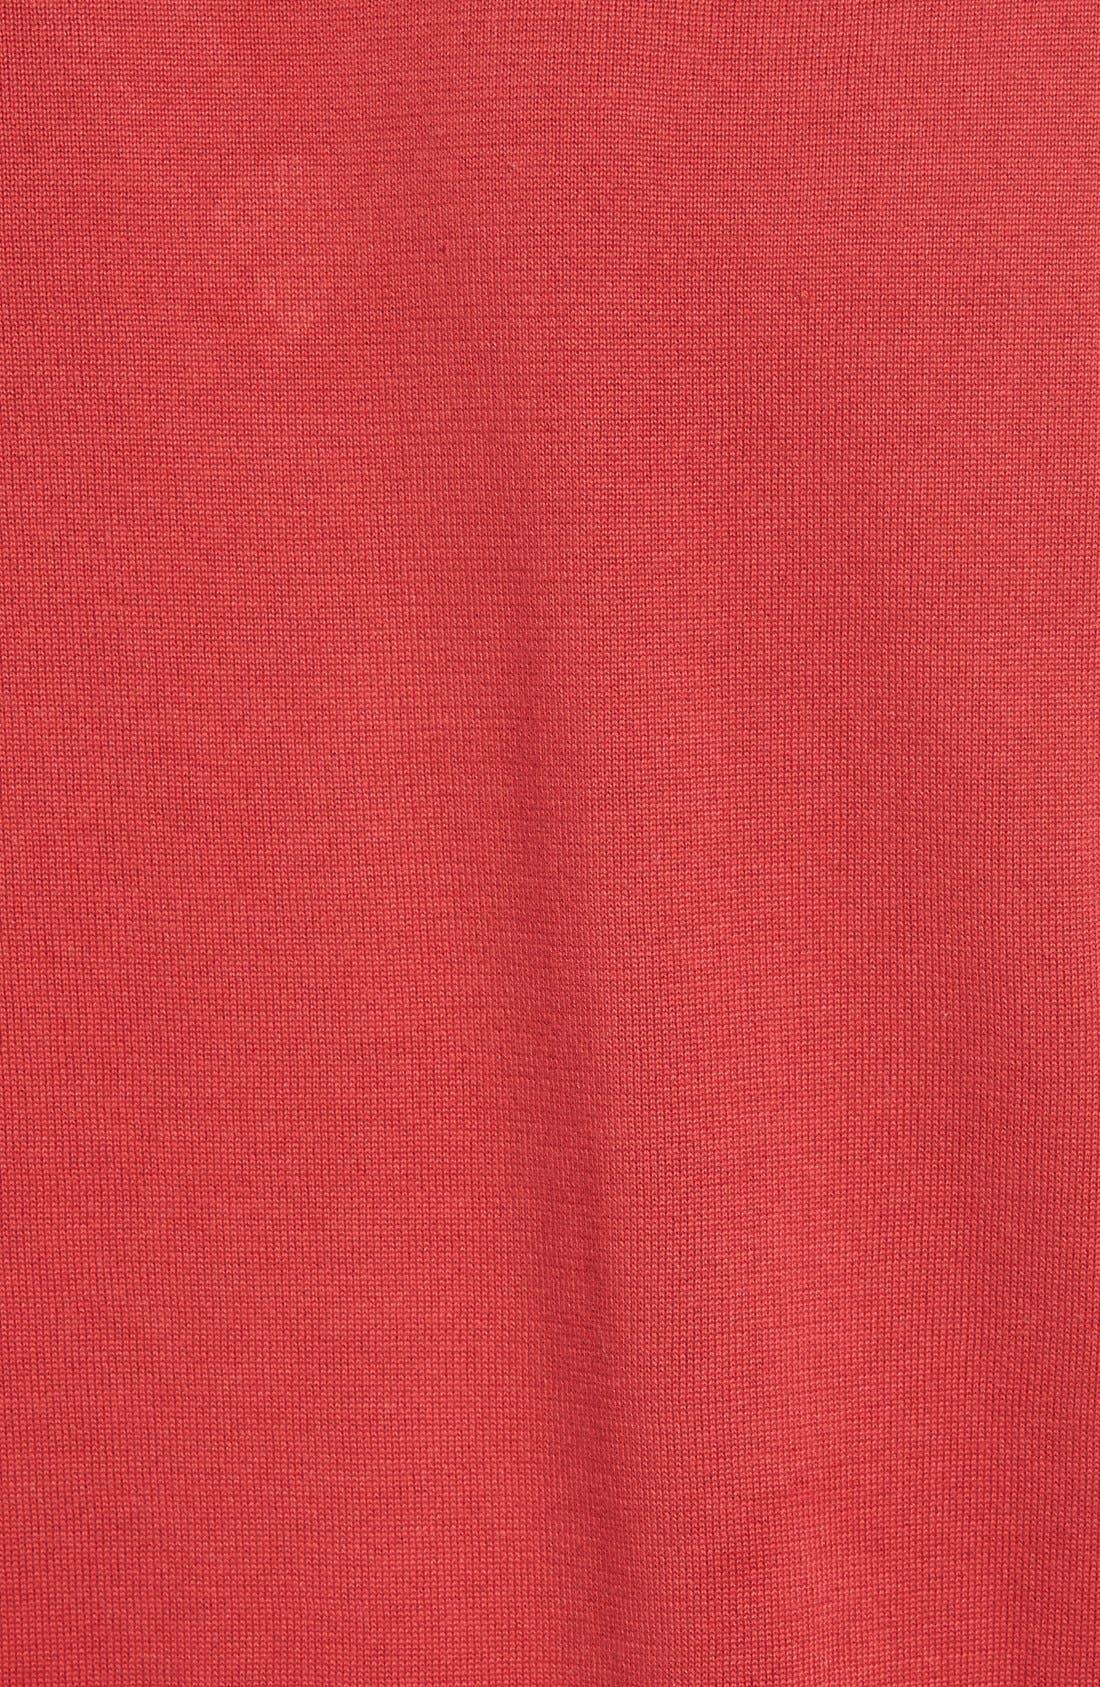 Cotton Jersey V-Neck Sweater,                             Alternate thumbnail 30, color,